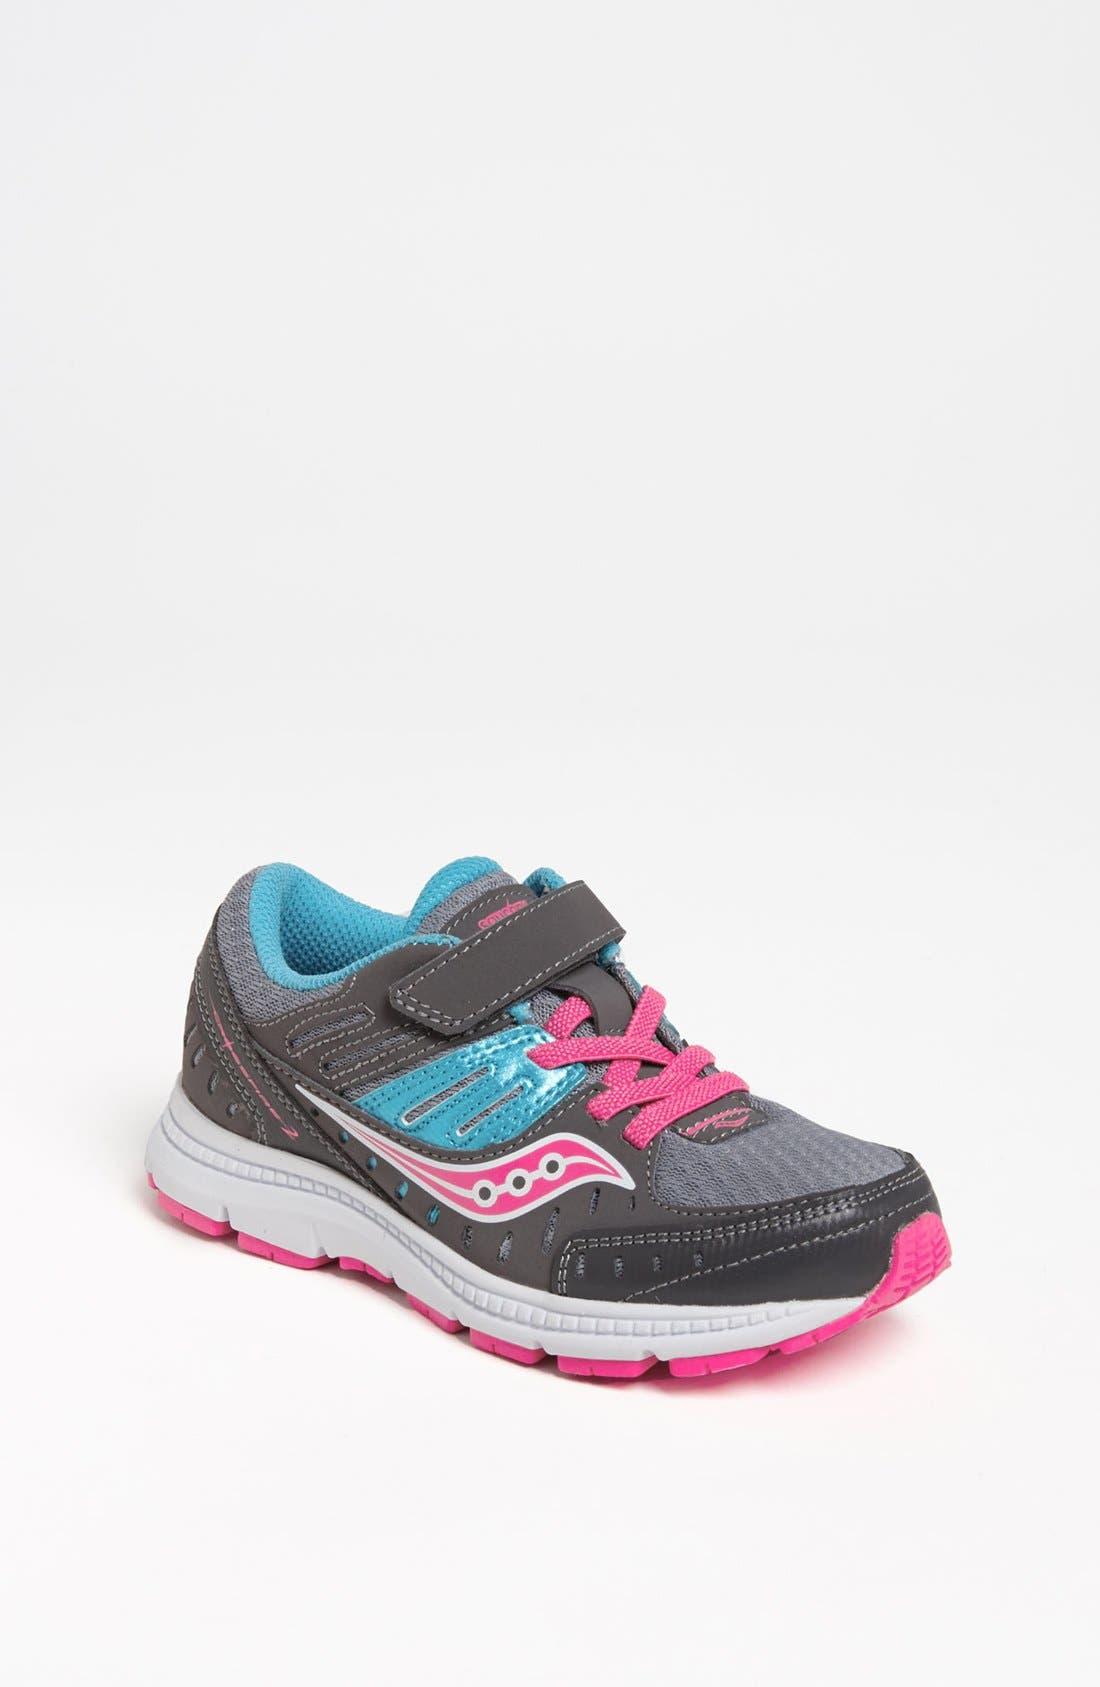 Main Image - Saucony 'Crossfire 2' Sneaker (Toddler & Little Kid)